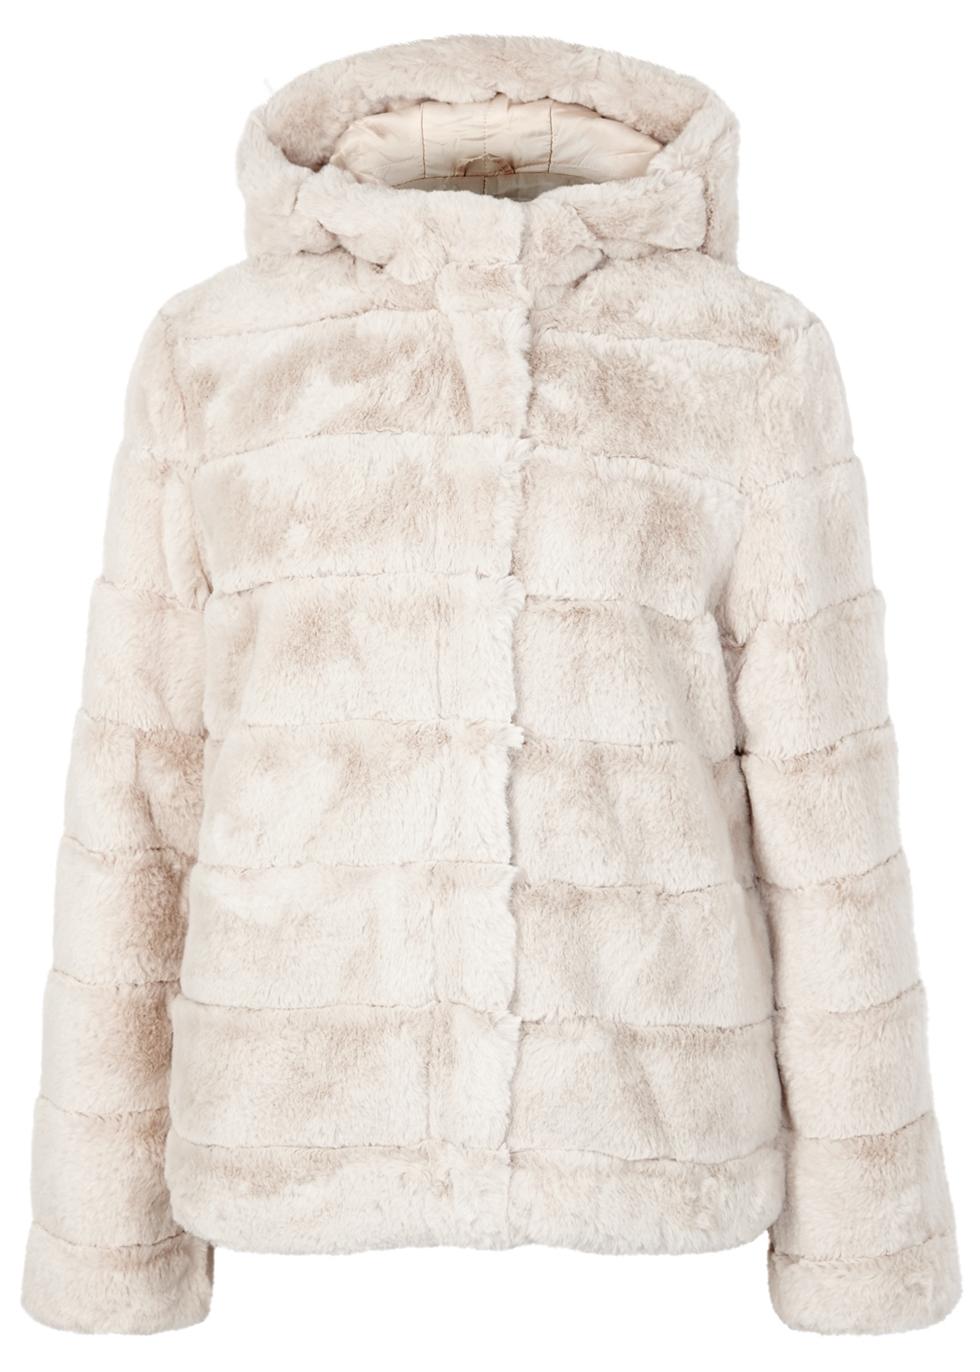 SAMS0E & SAMS0E Saba Stone Quilted Faux Fur Coat in Beige